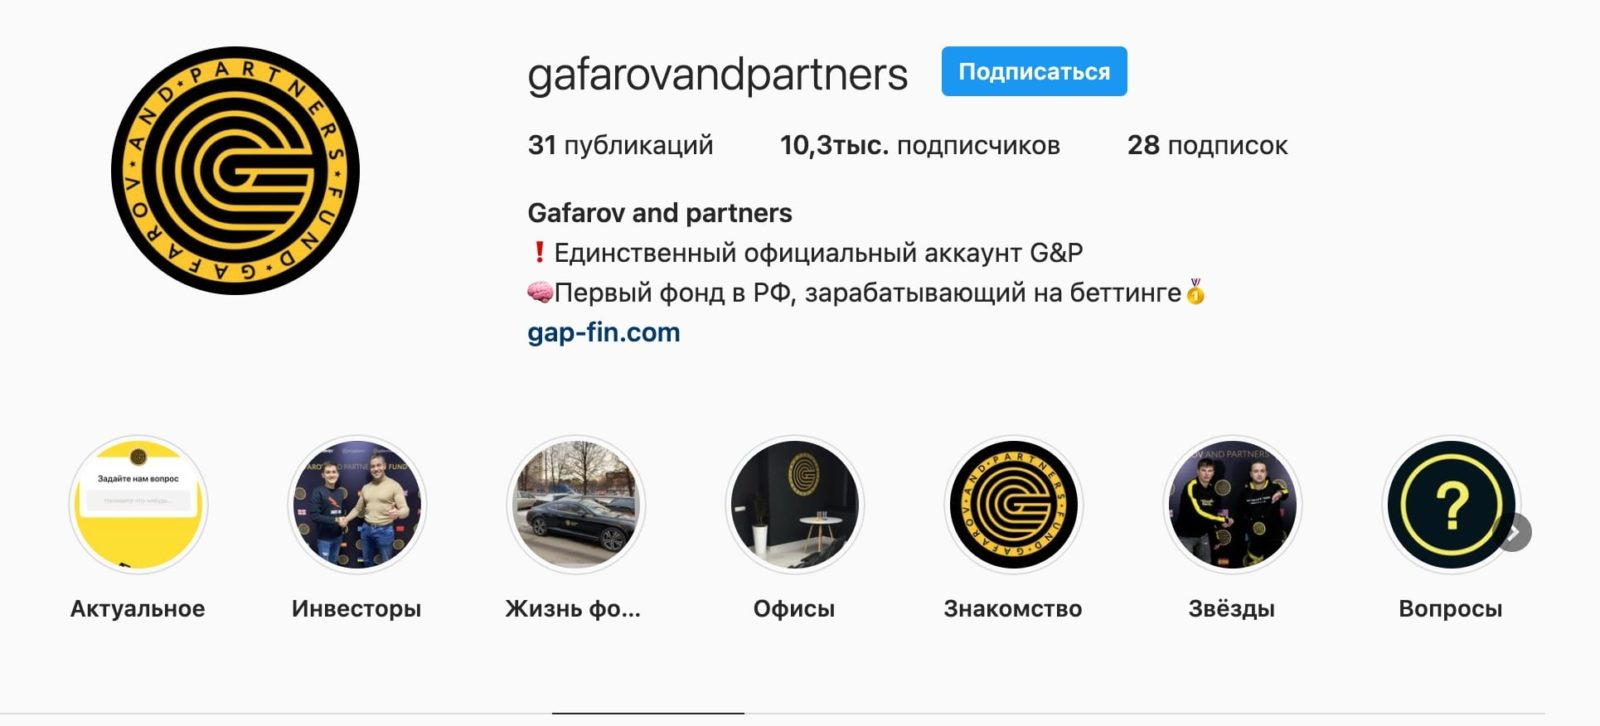 Инстаграм Эрика Гафарова (Gap fin com)